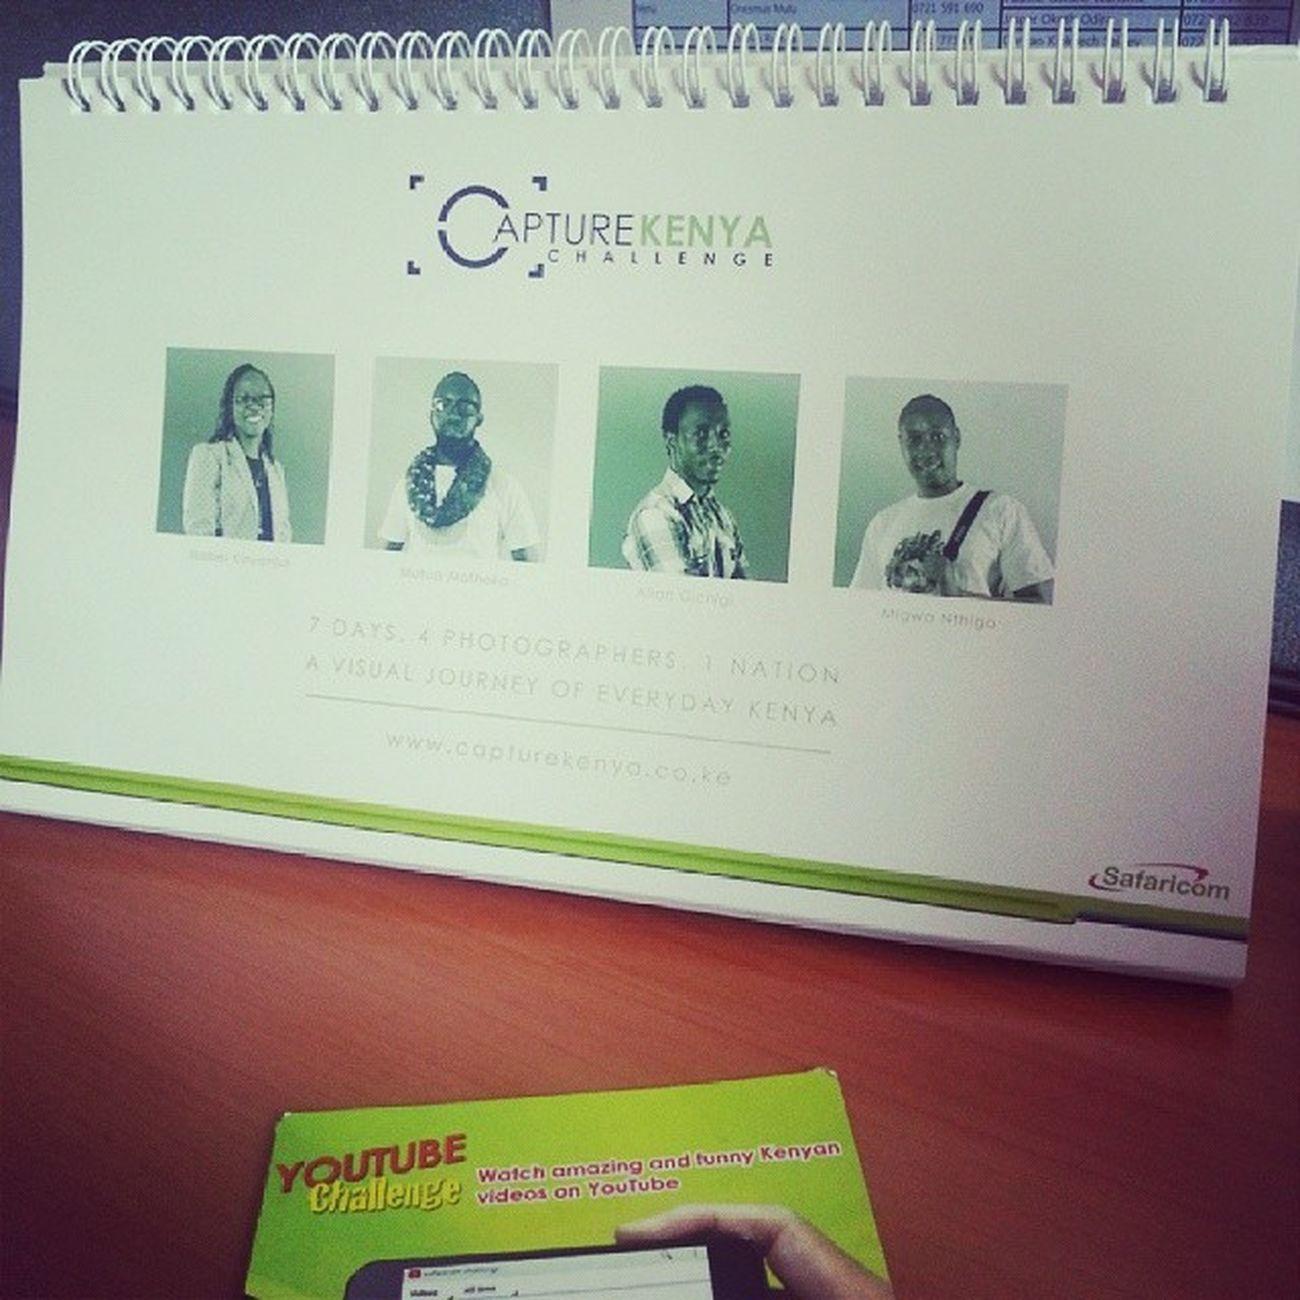 2014 calendar CaptureKenya